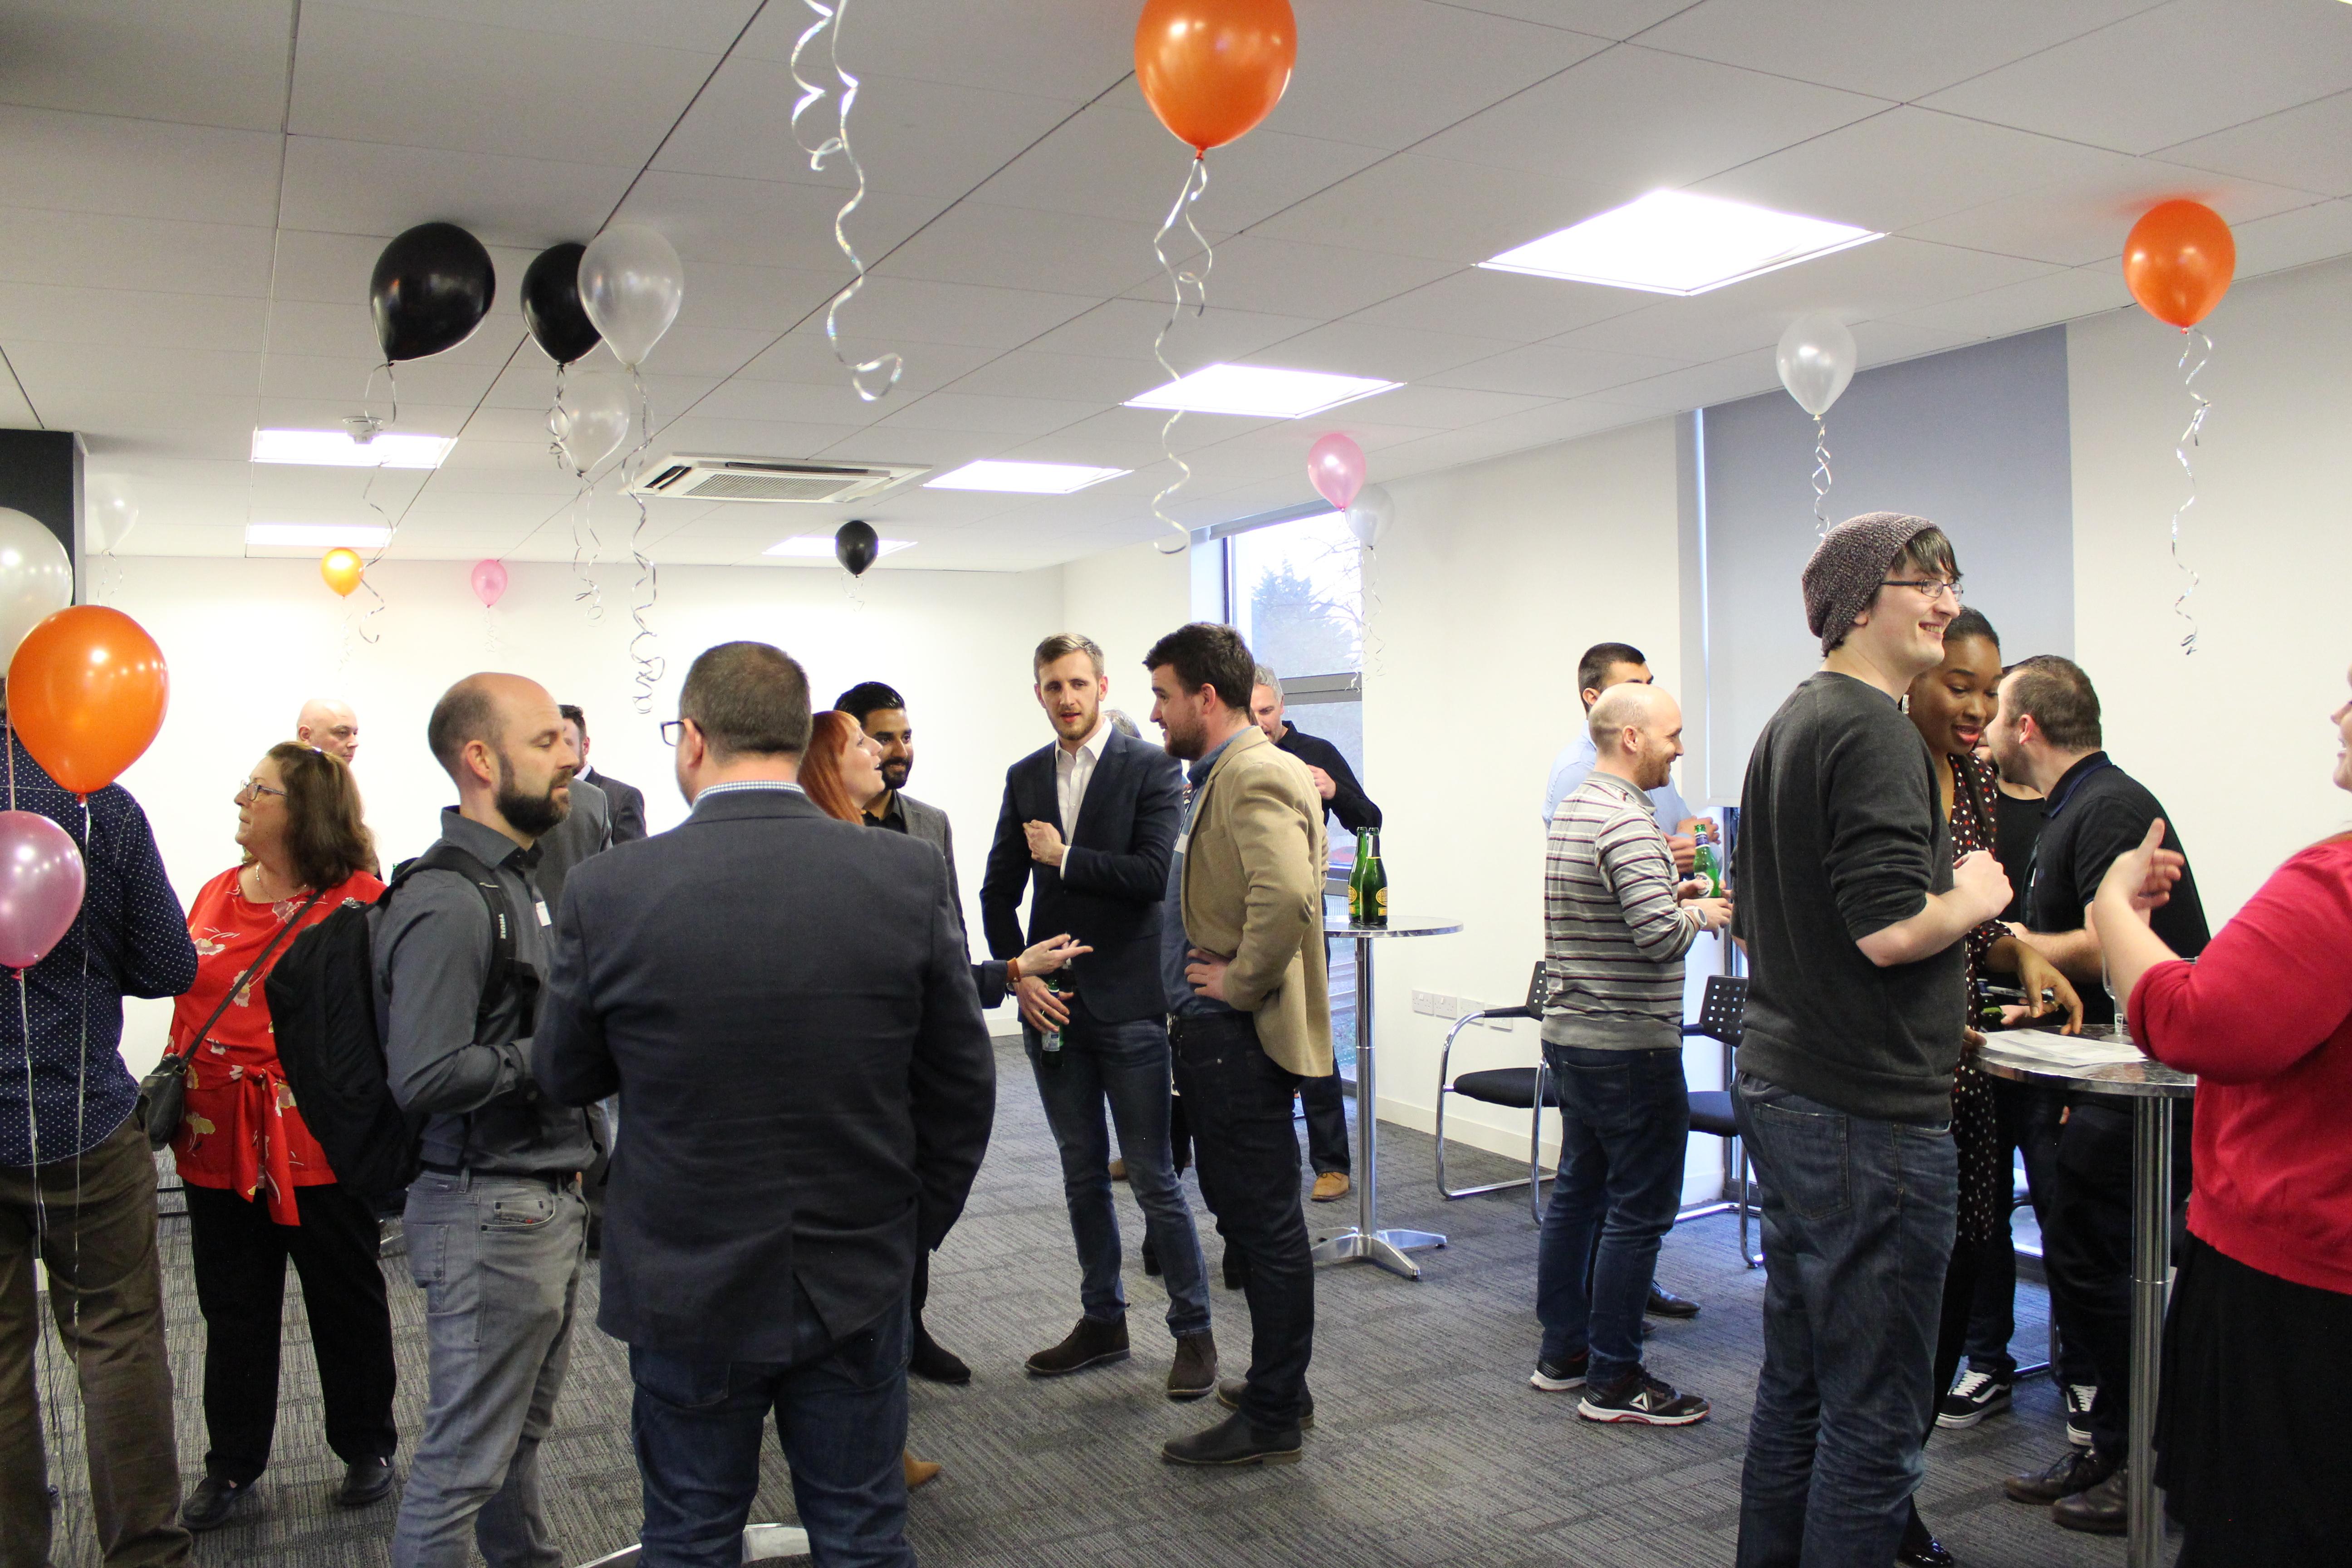 Sotic launch party